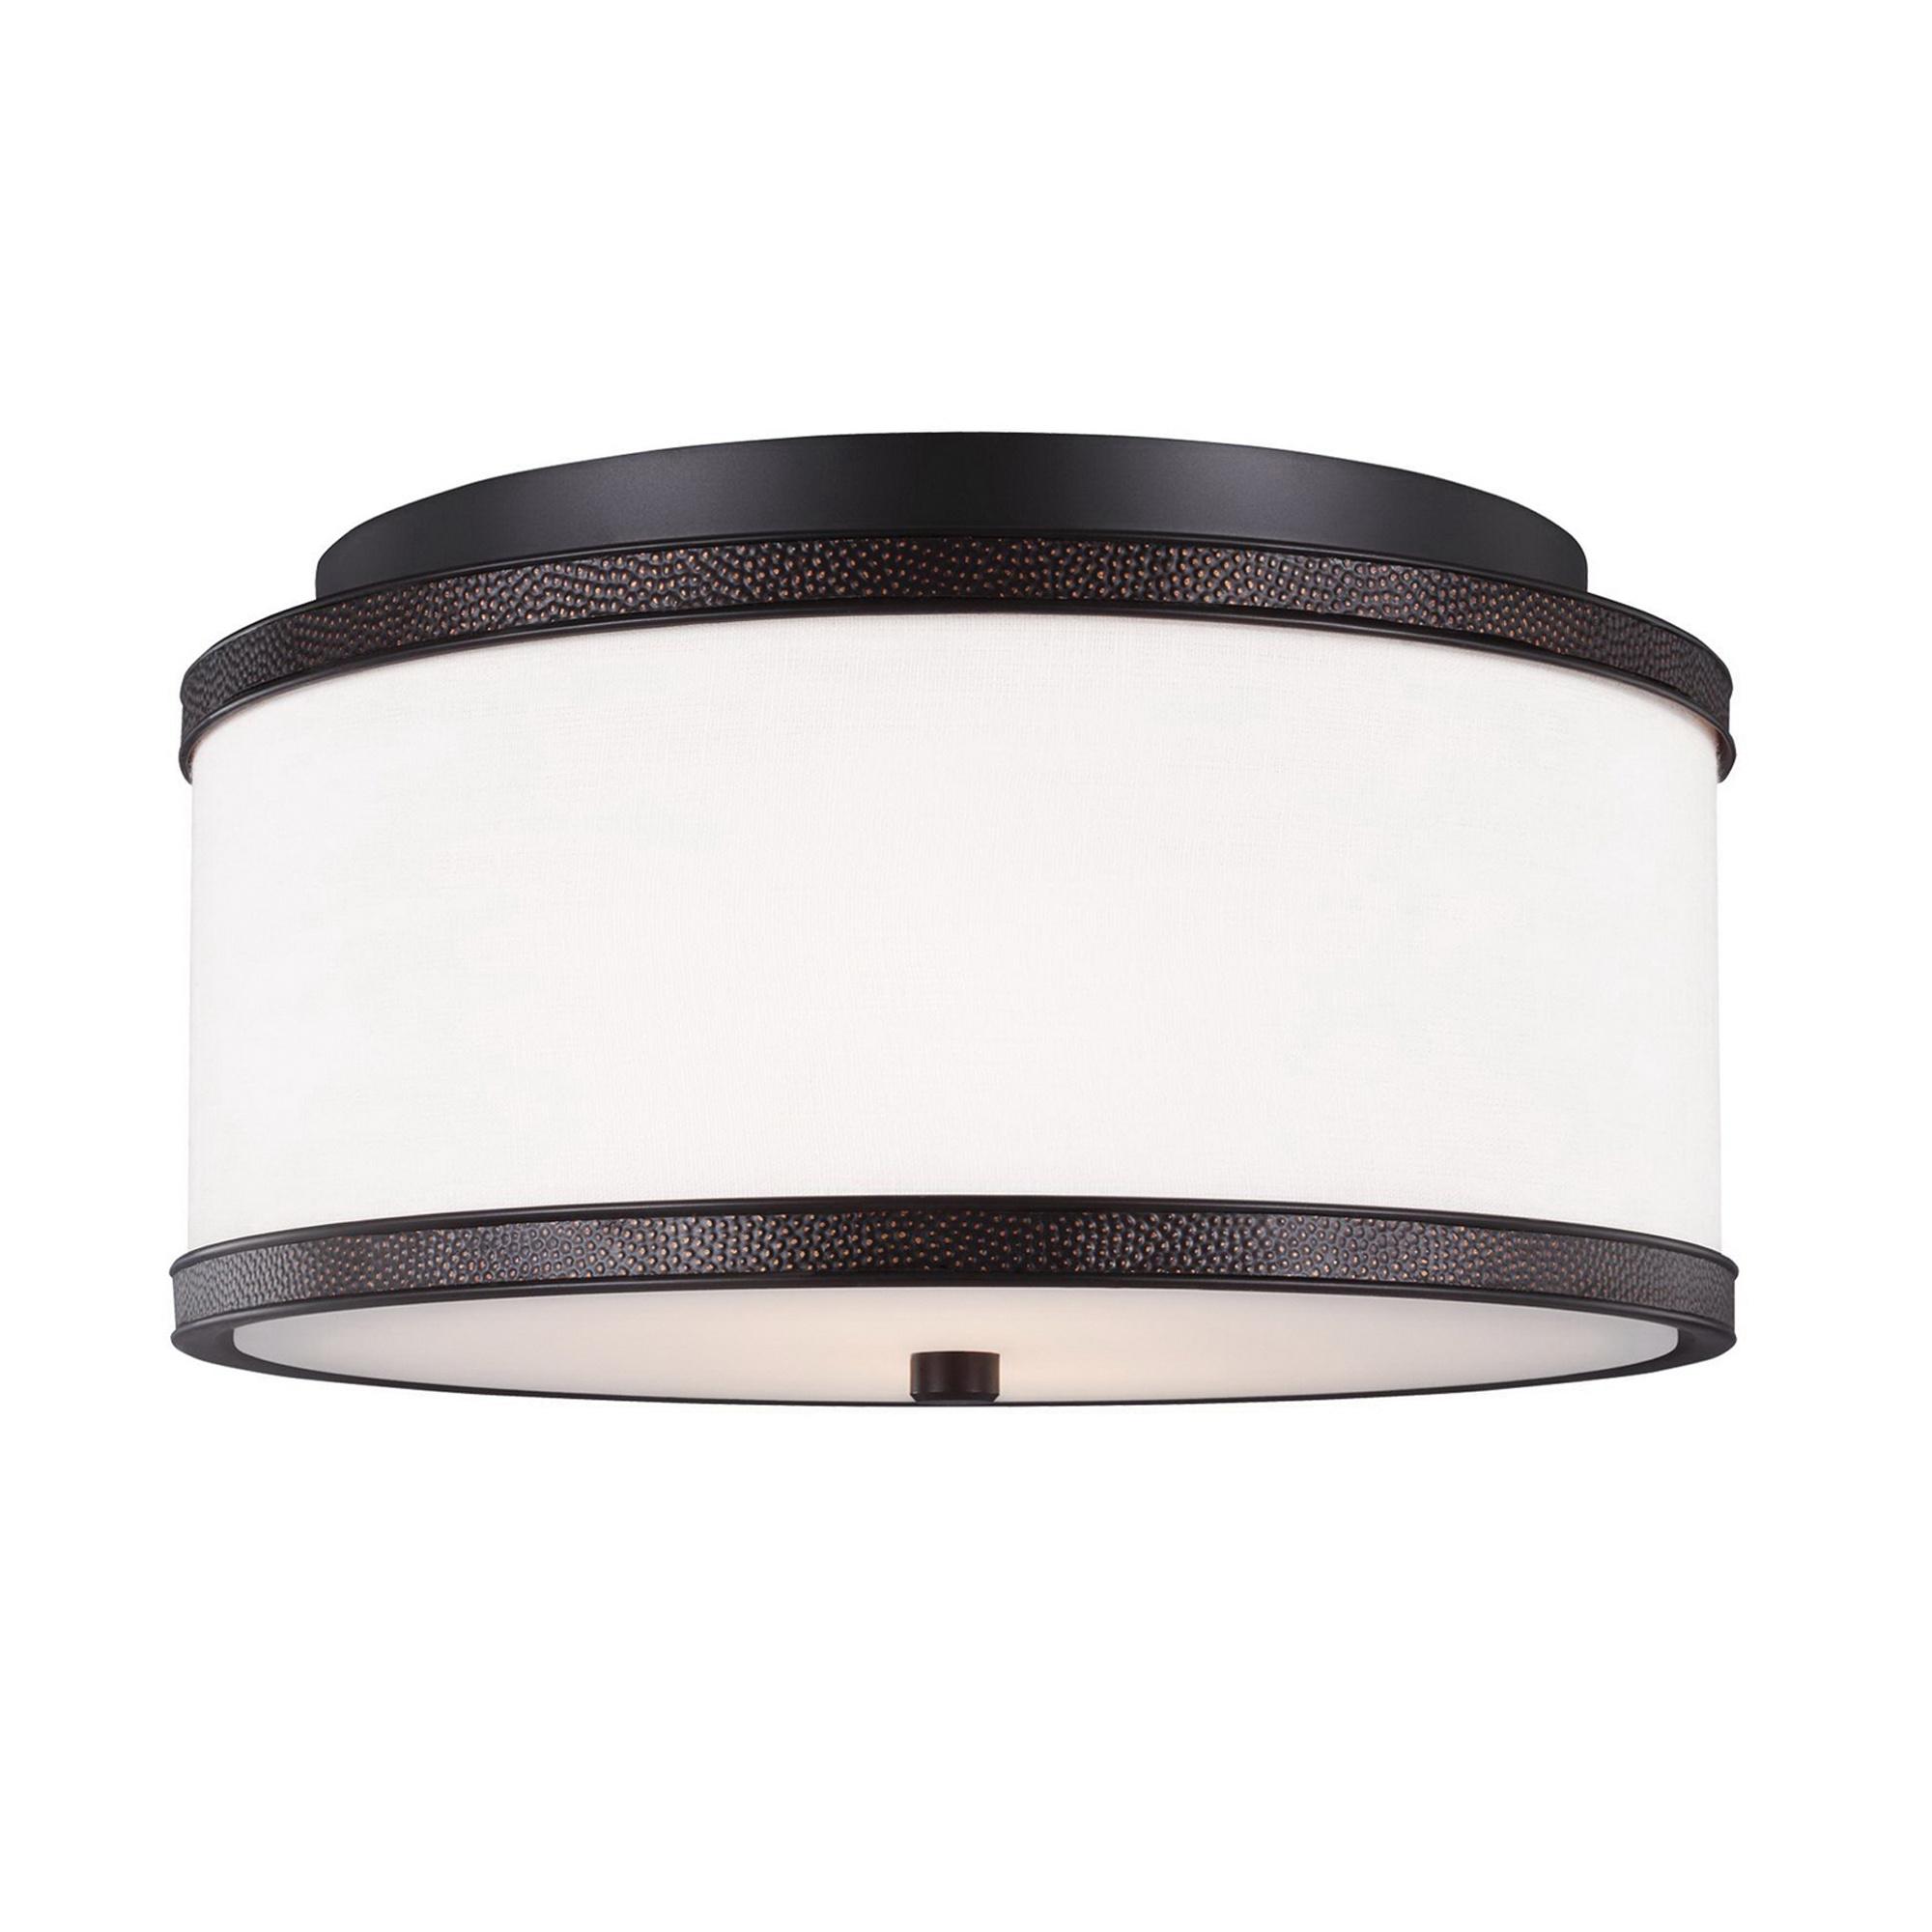 Murray Feiss Marteau – Lamps